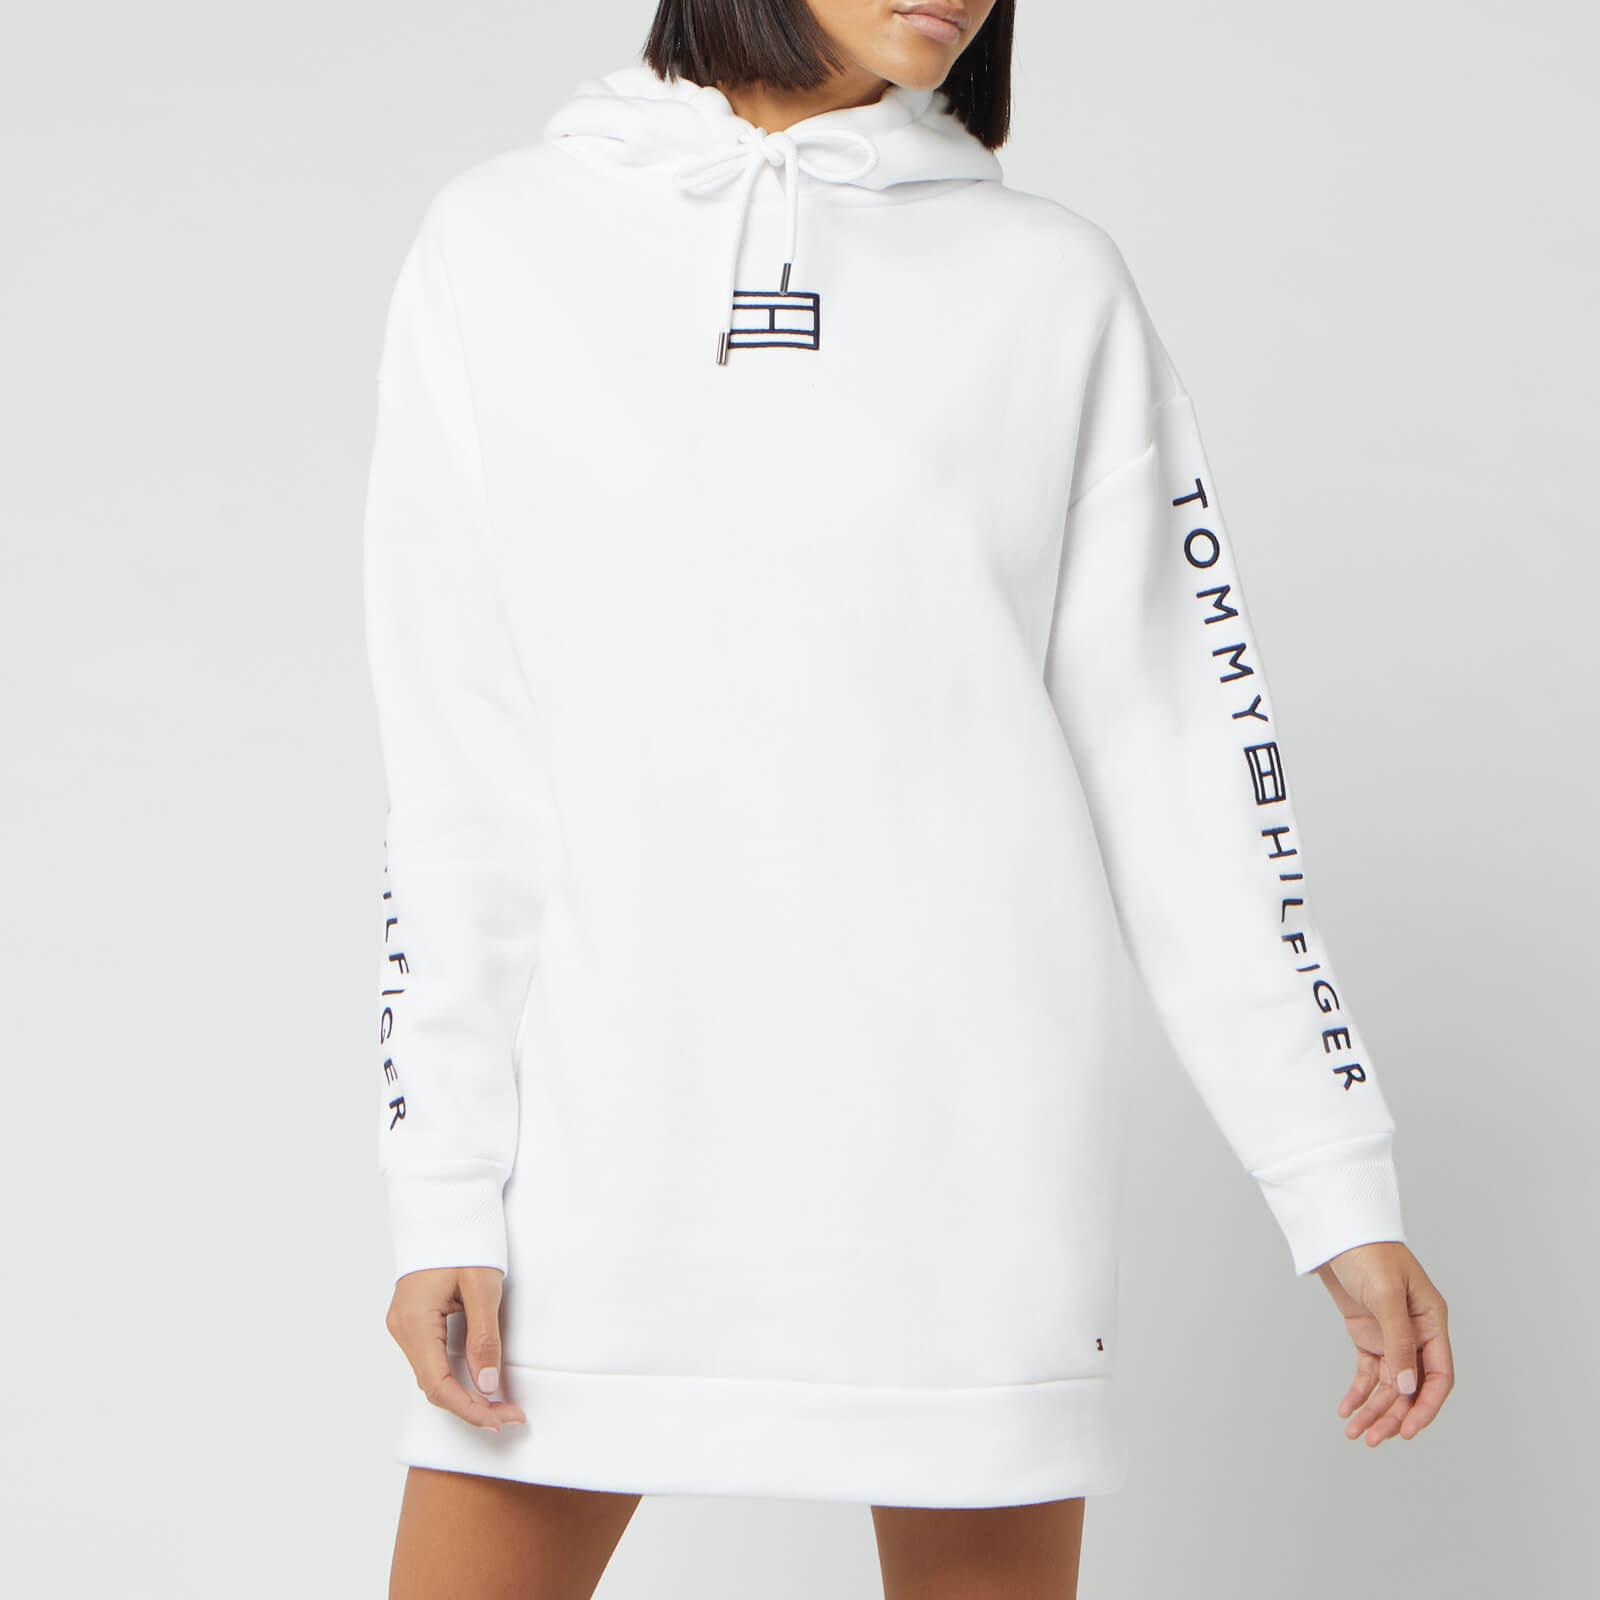 Tommy Hilfiger Women's Paloma Hooded Dress - White - L